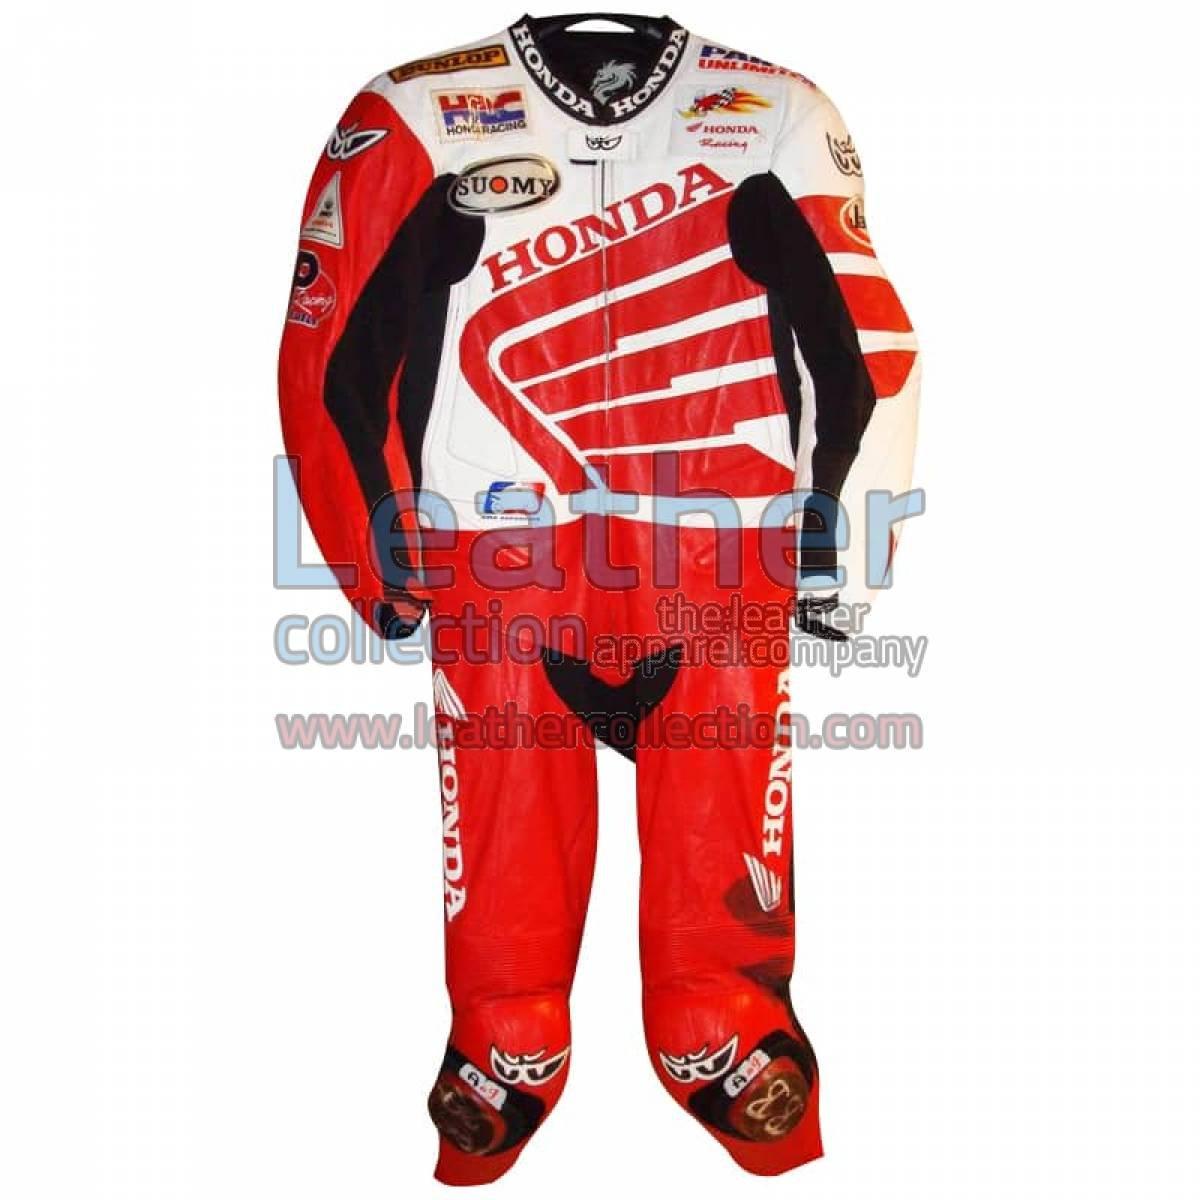 Ben Bostrom American Honda 2004 AMA Leathers